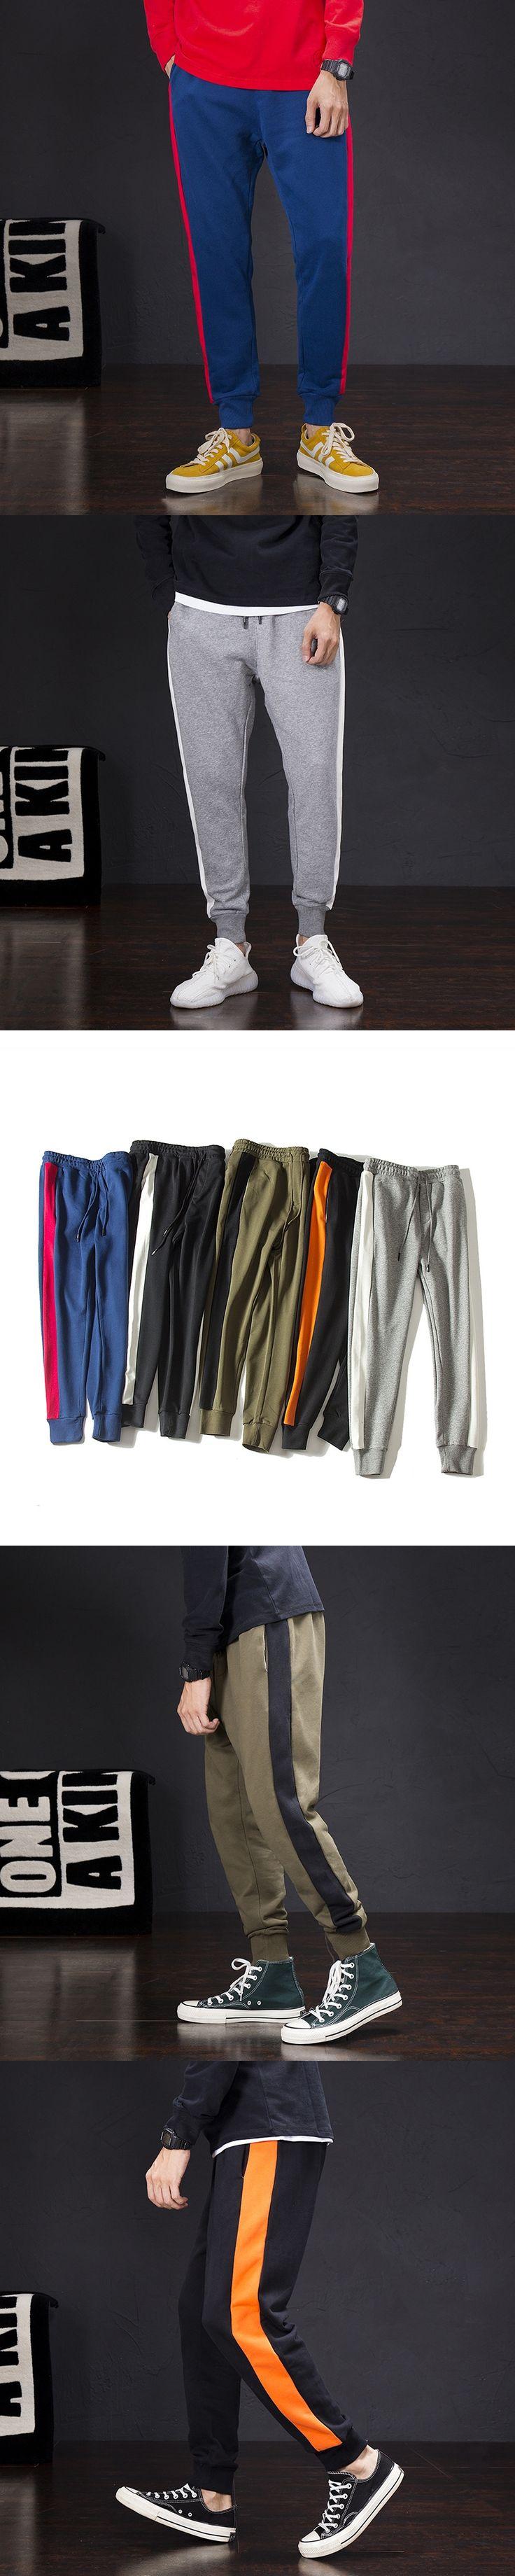 Autumn New Men Casual Cotton Pant Male Fashion Loose Full Length Harem Trousers Streetwear Joggers Sweatpants